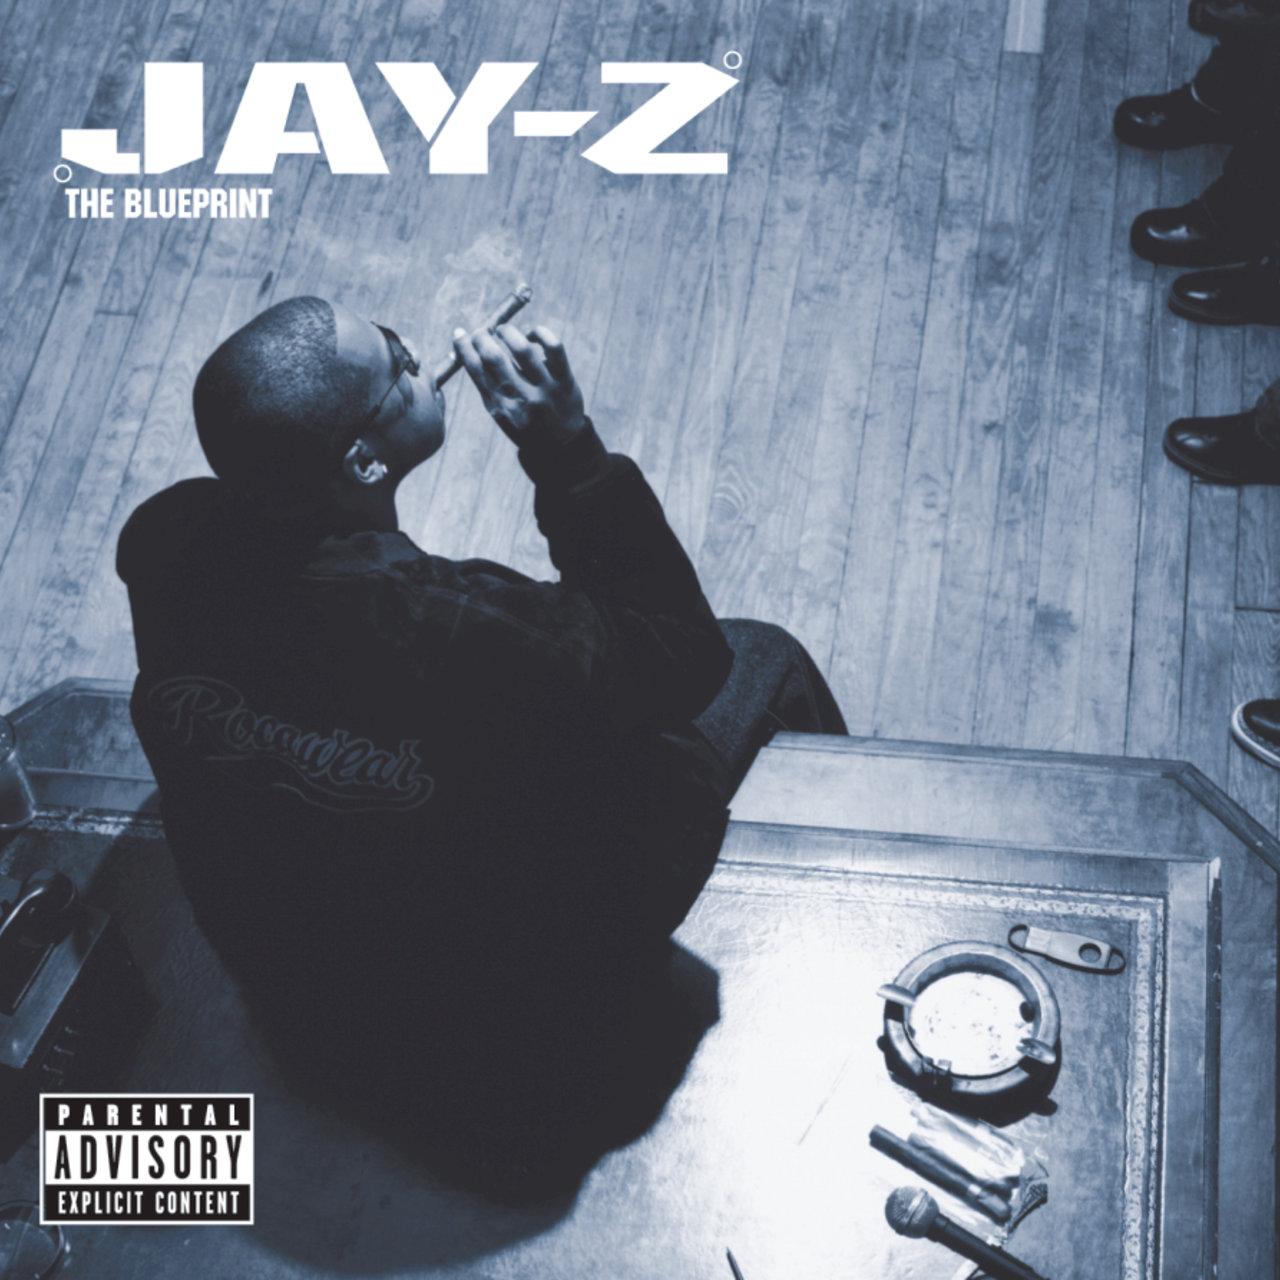 Jay-Z - The Blueprint (Cover)